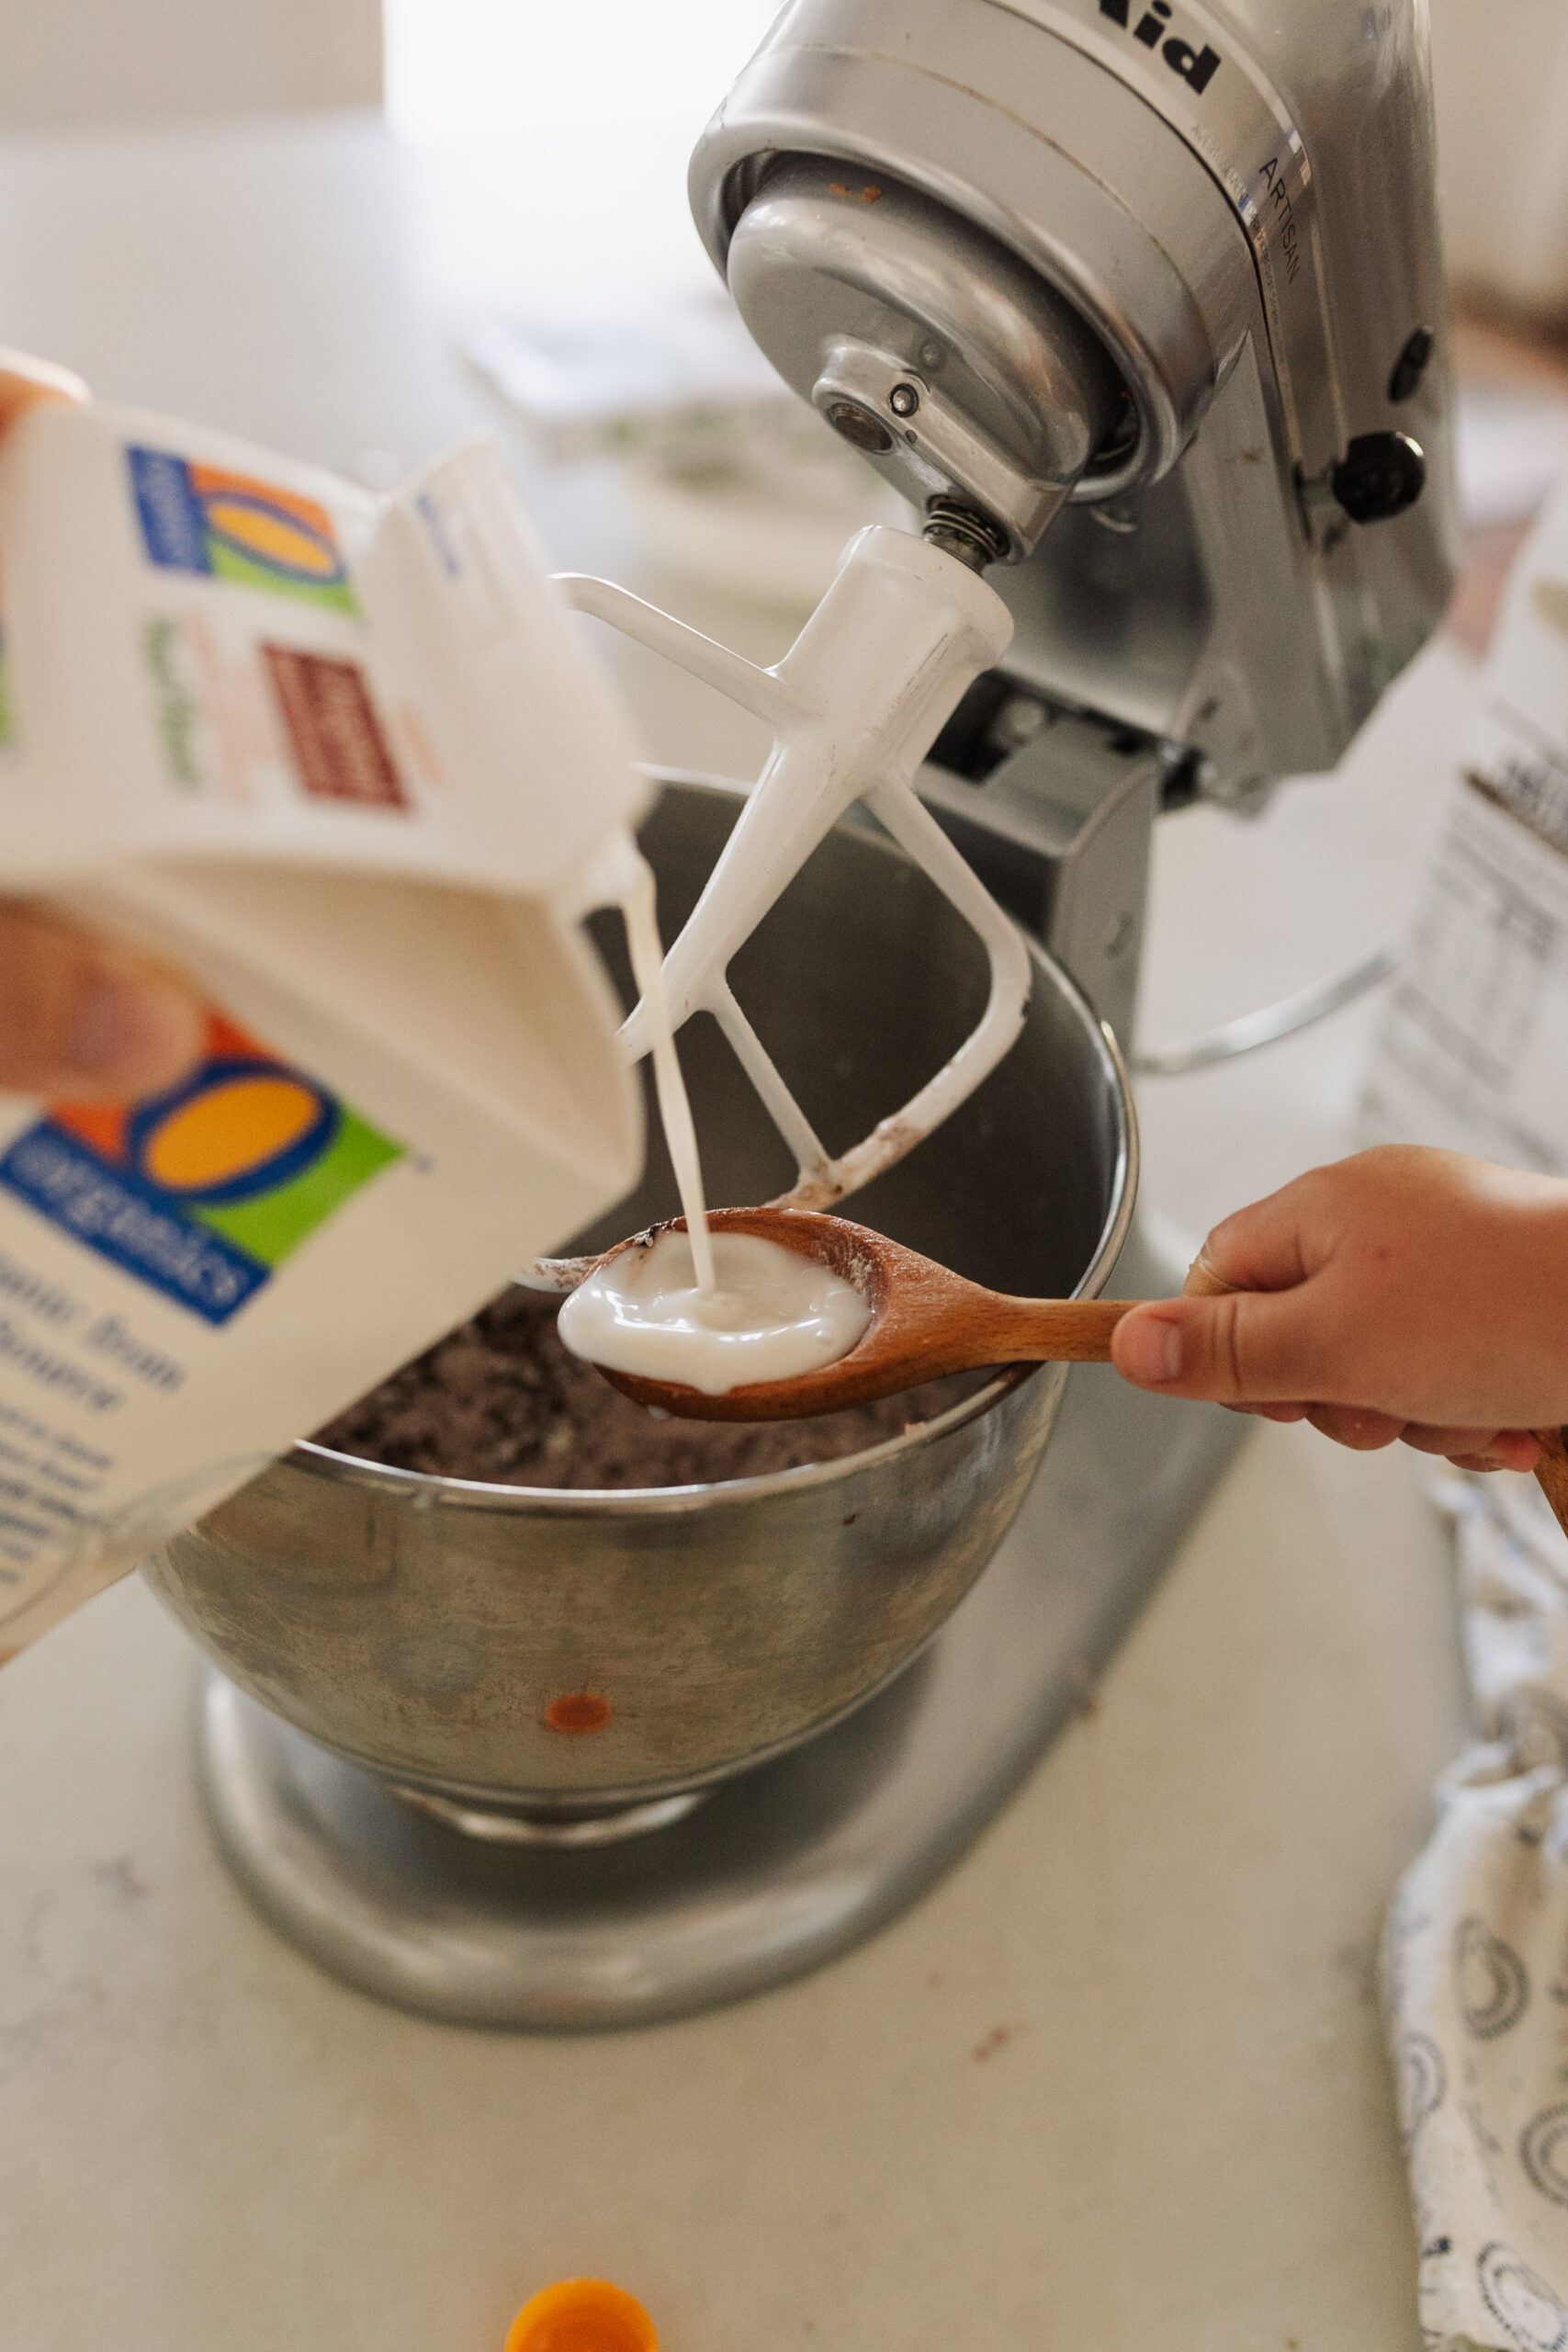 o organic milk going into our vegan buttercream frosting. #theldlhome #thelovedesignedlife #veganbaking